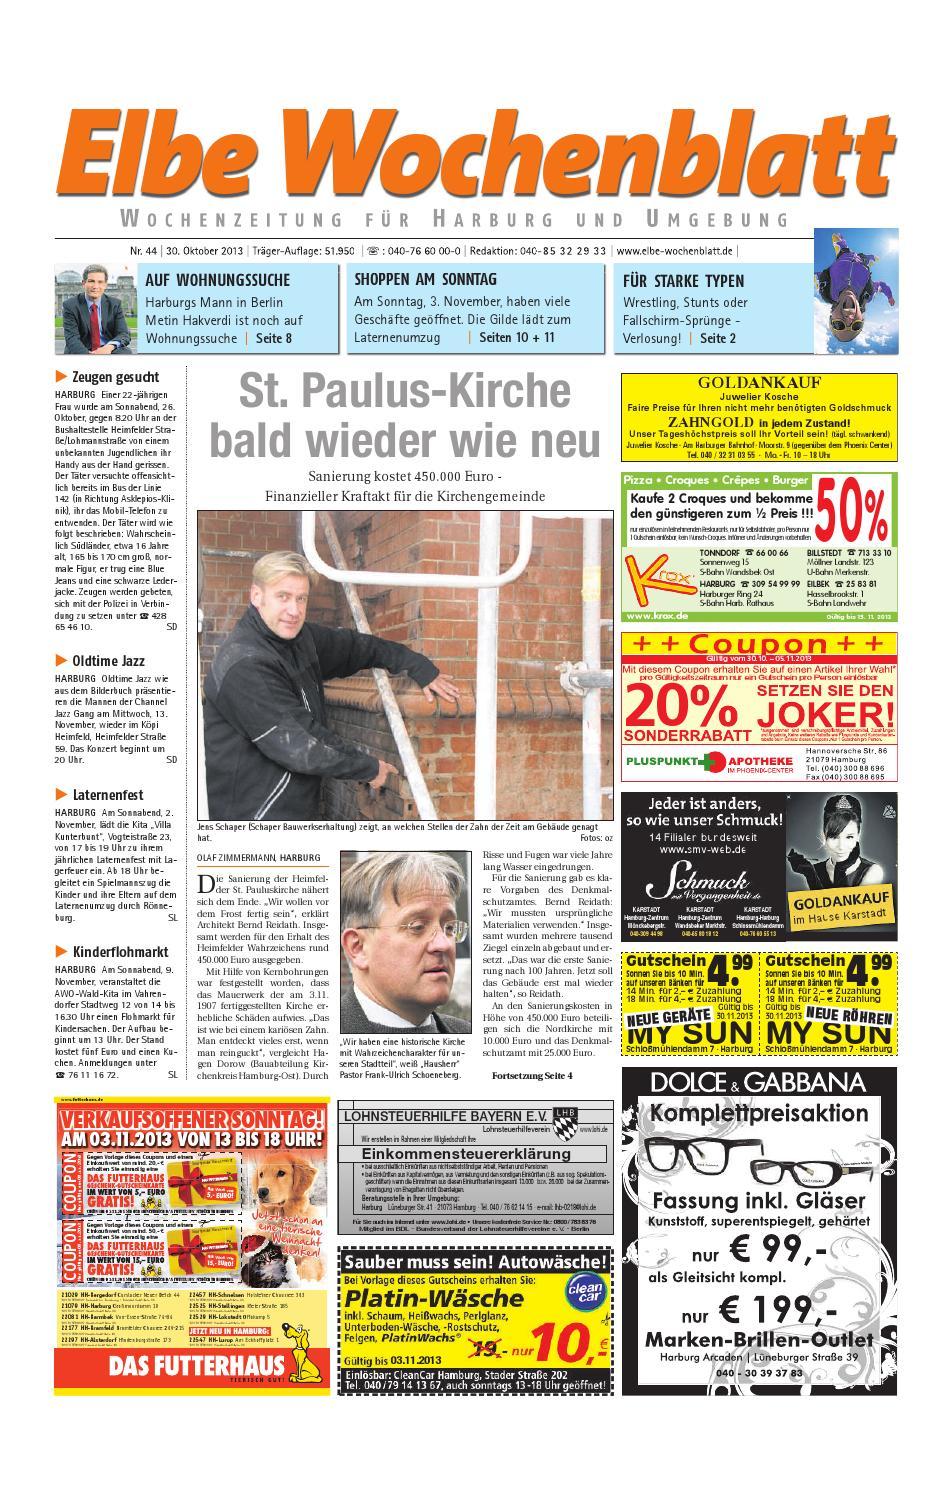 Harburg KW44 2013 By Elbe Wochenblatt Verlagsgesellschaft MbH & Co